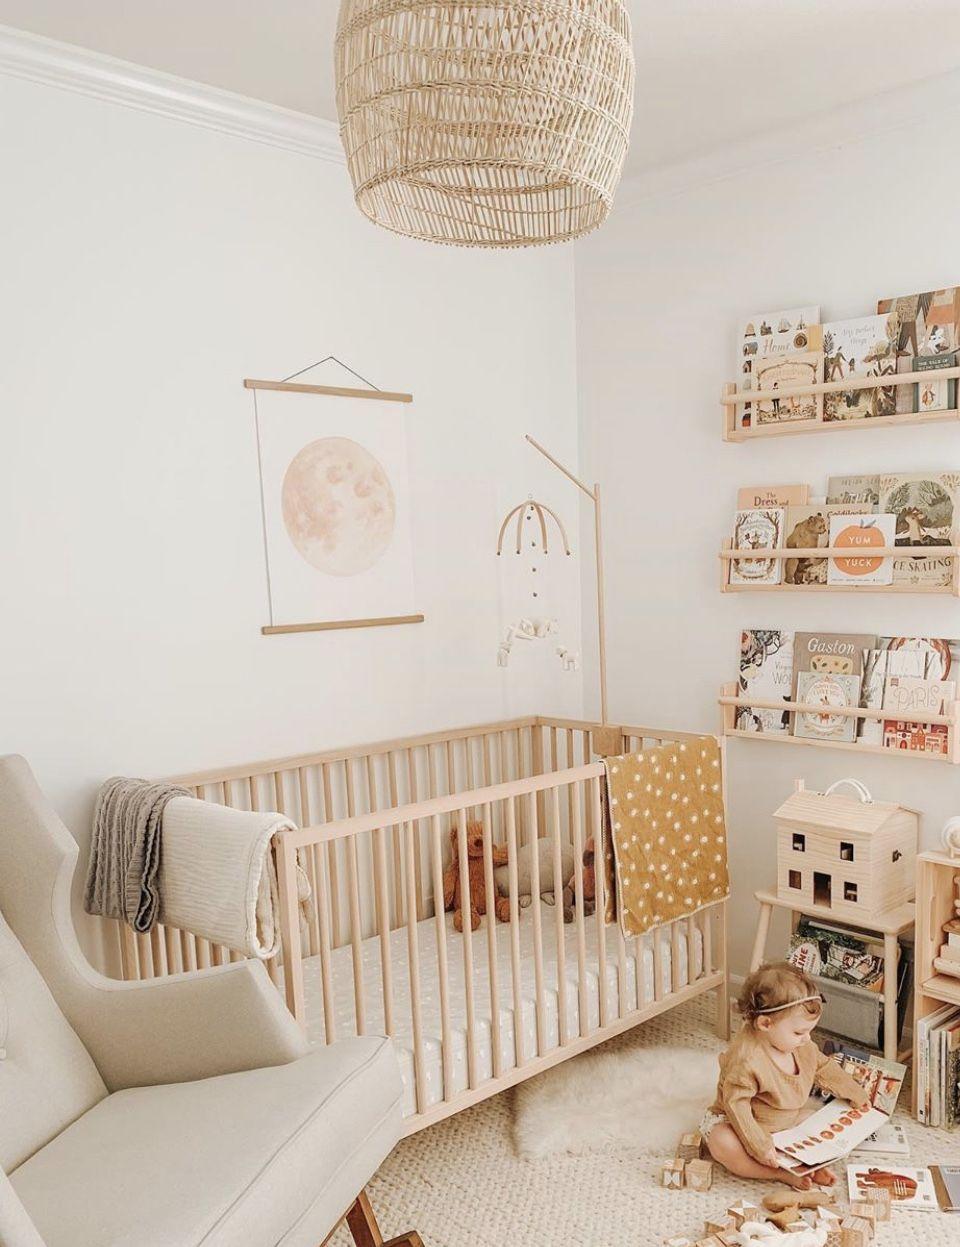 affordable nursery furniture sets on win a dream nursery affordable nursery furniture nursery furniture sets nursery furniture nursery furniture sets